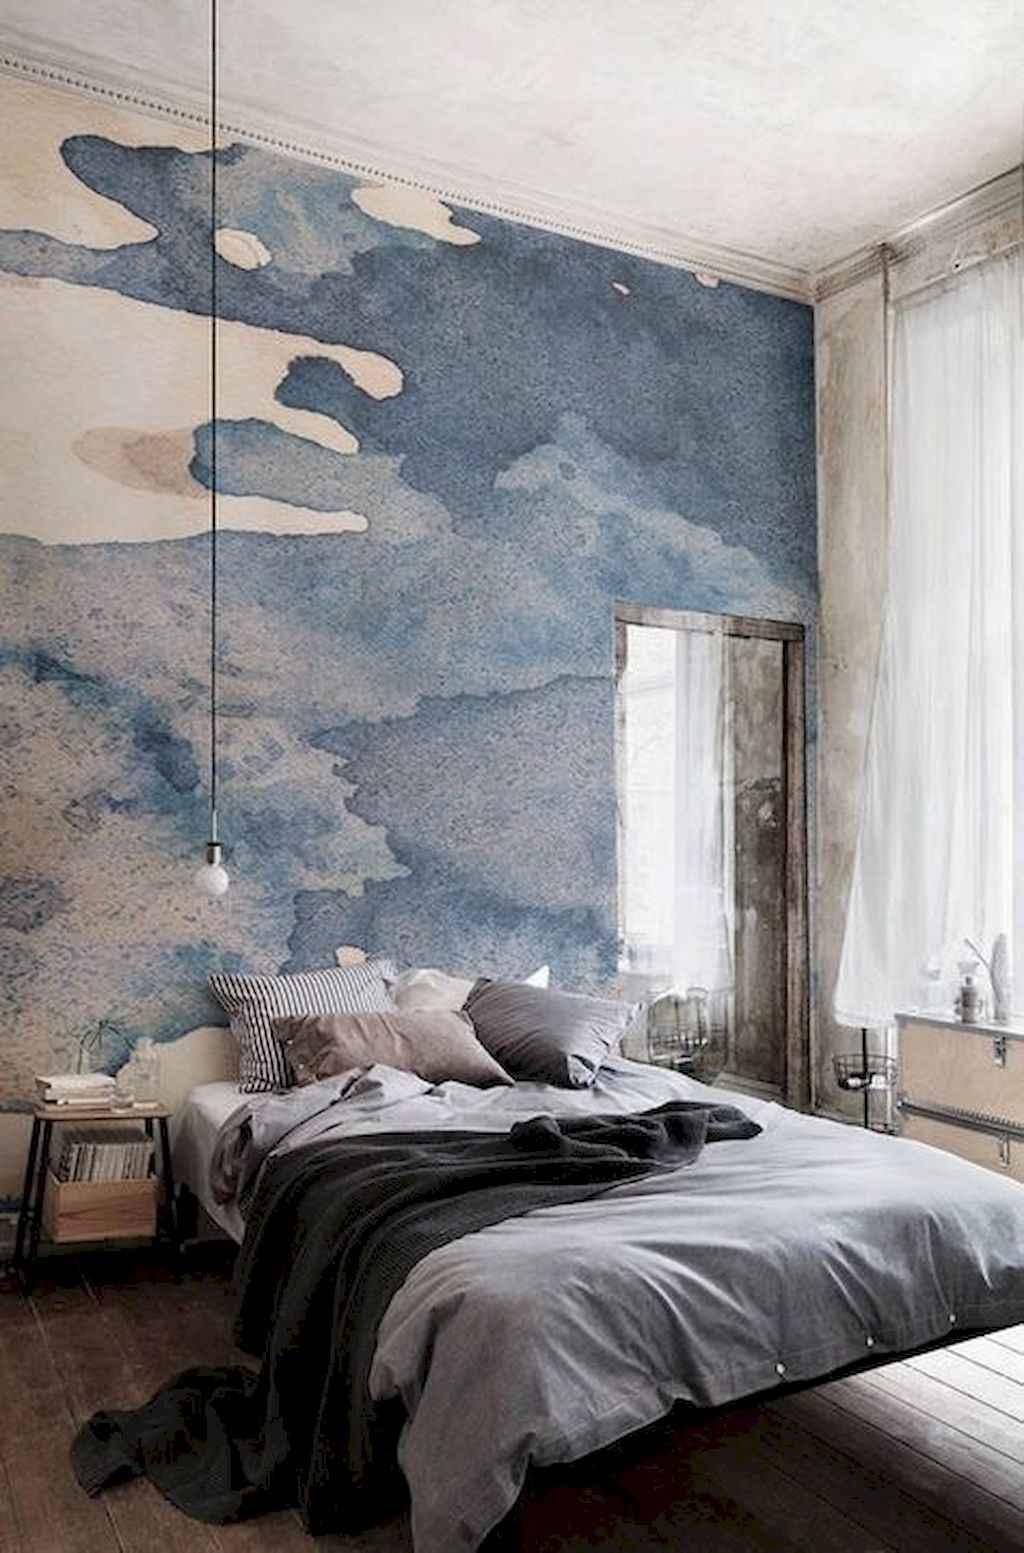 Cool creative loft apartment decorating ideas (59)